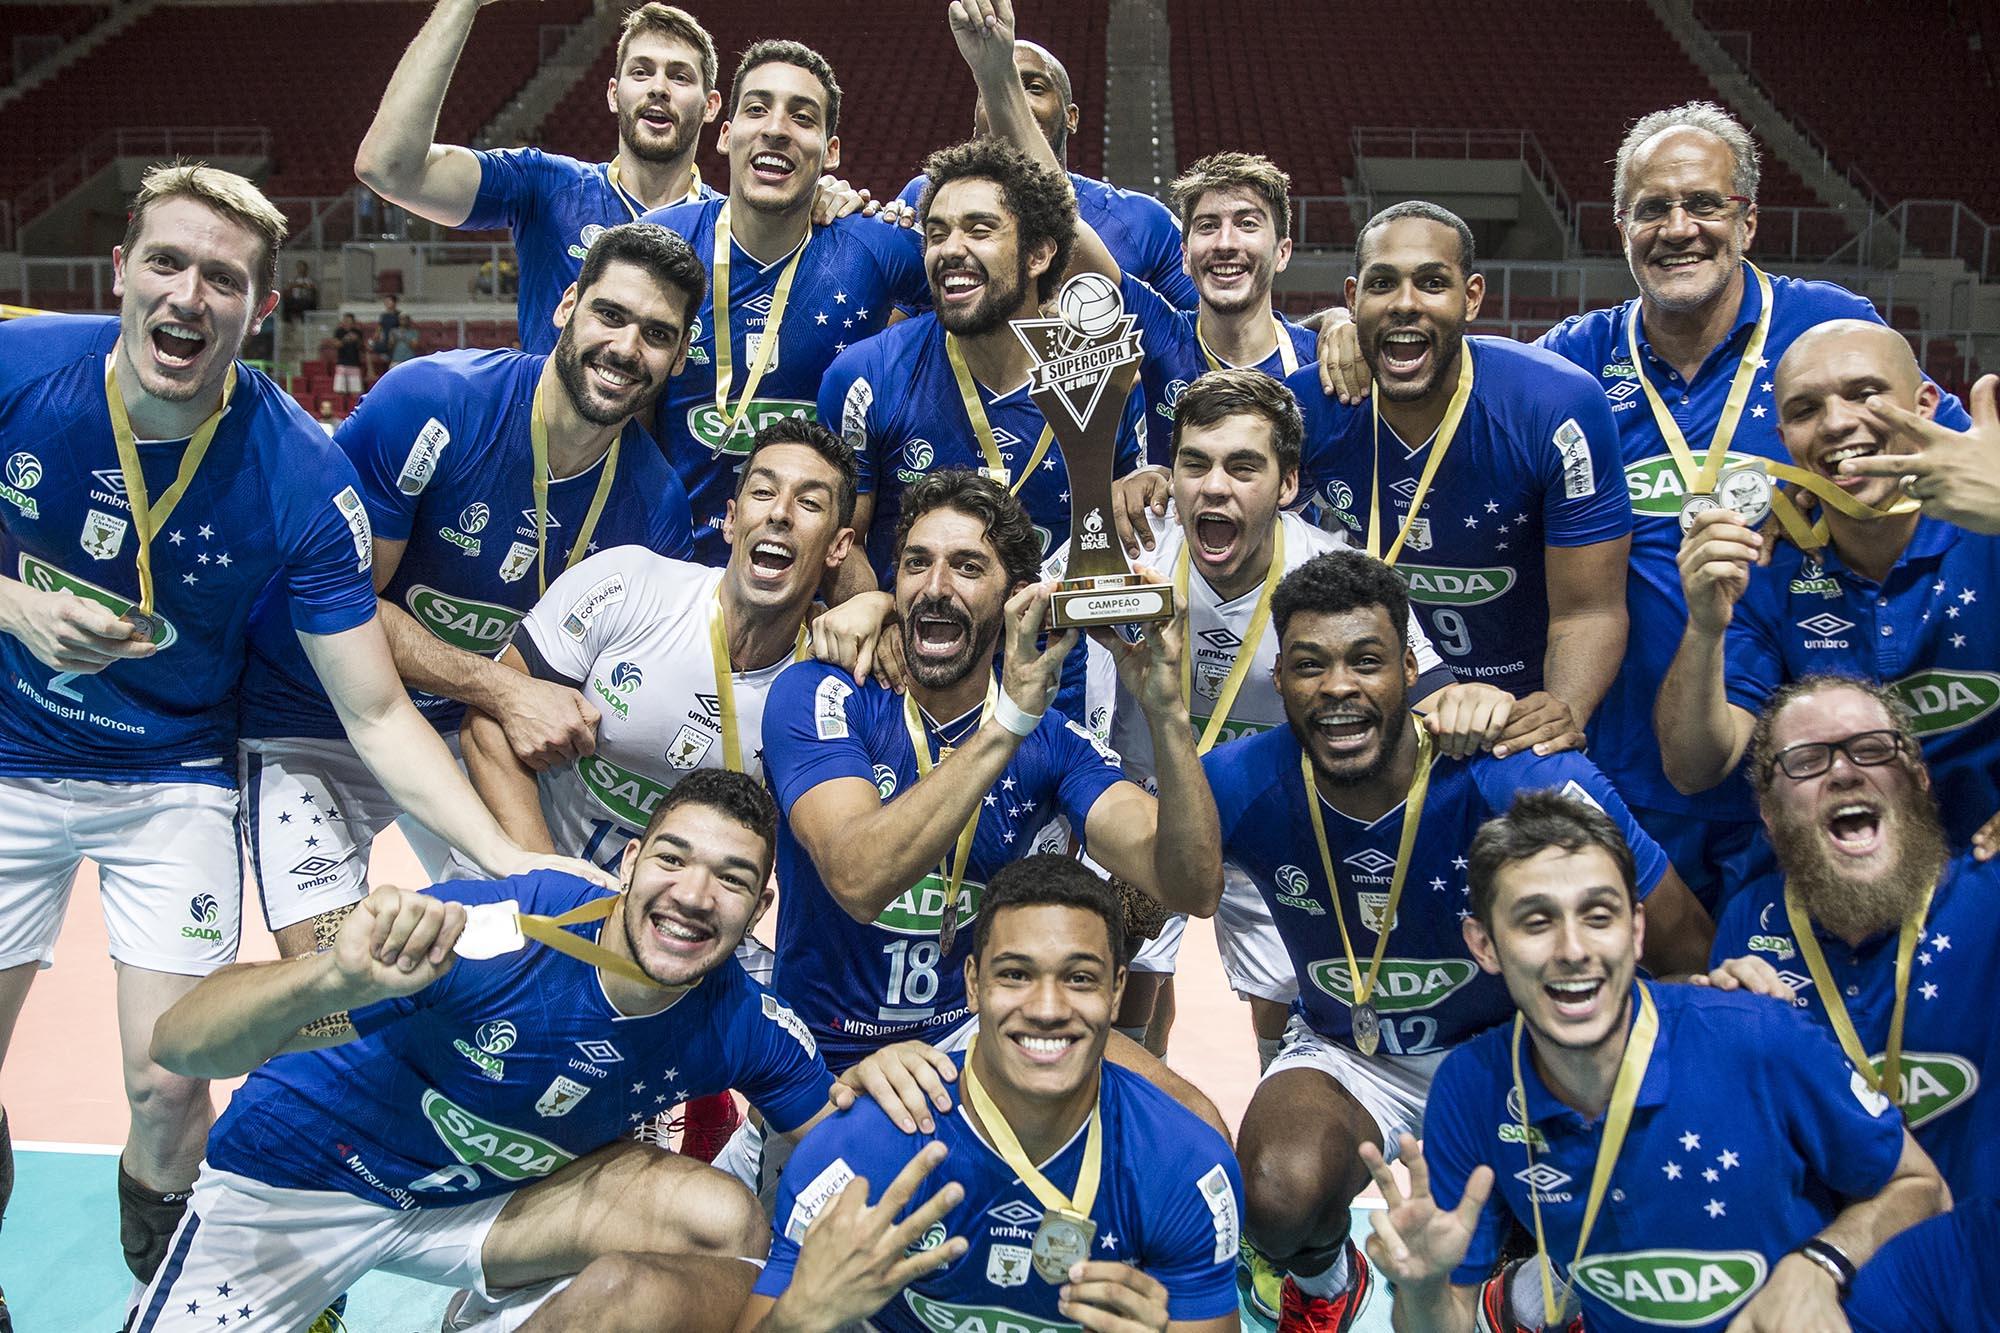 Confronto entre Sada Cruzeiro e Sesi-SP abre a temporada nacional de clubes